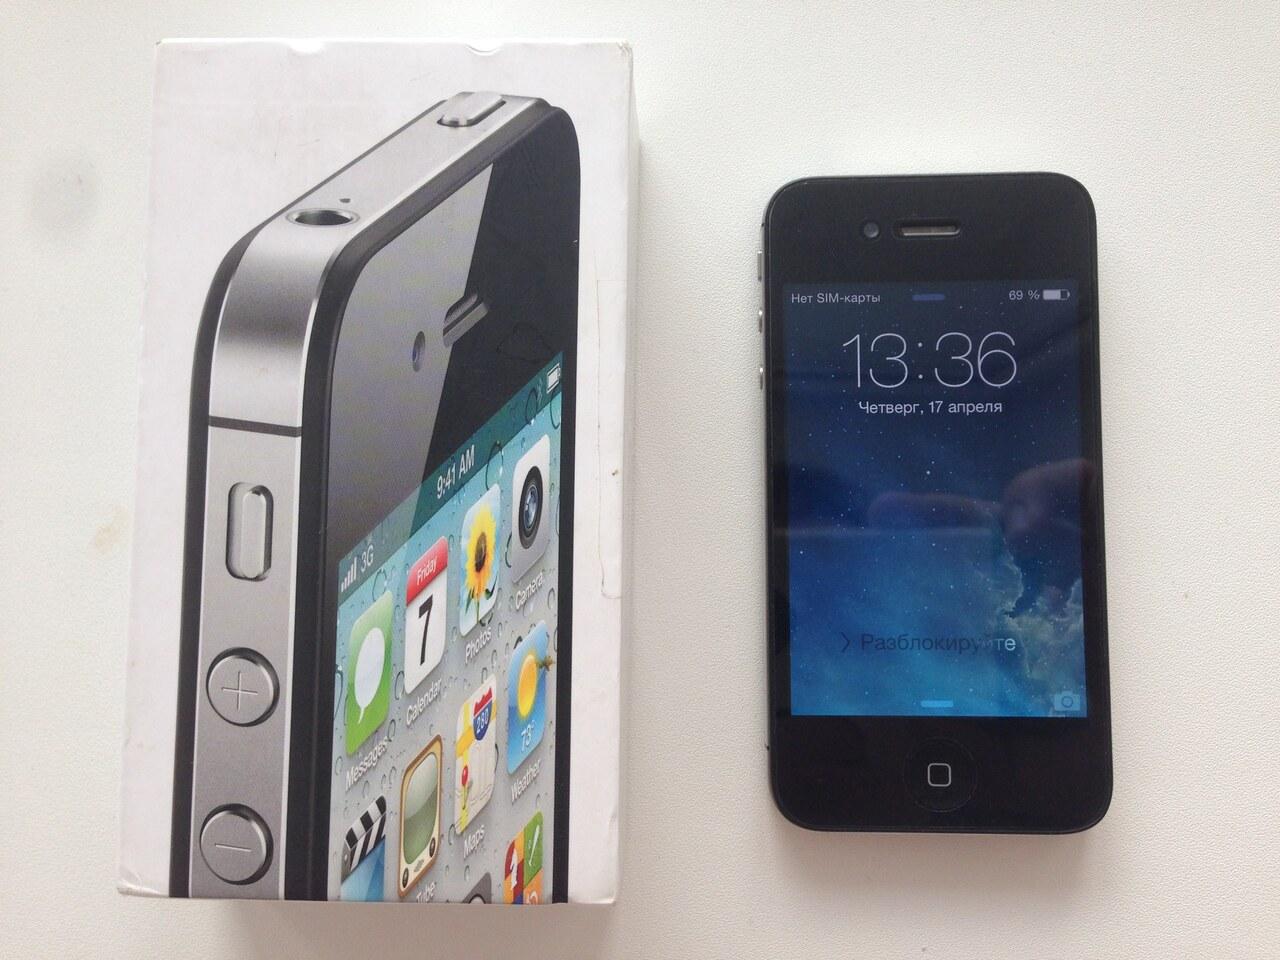 Какие устройства удивили за 2010-2019 год? / Оригинал iPhone 4S 9 - lenium.ru